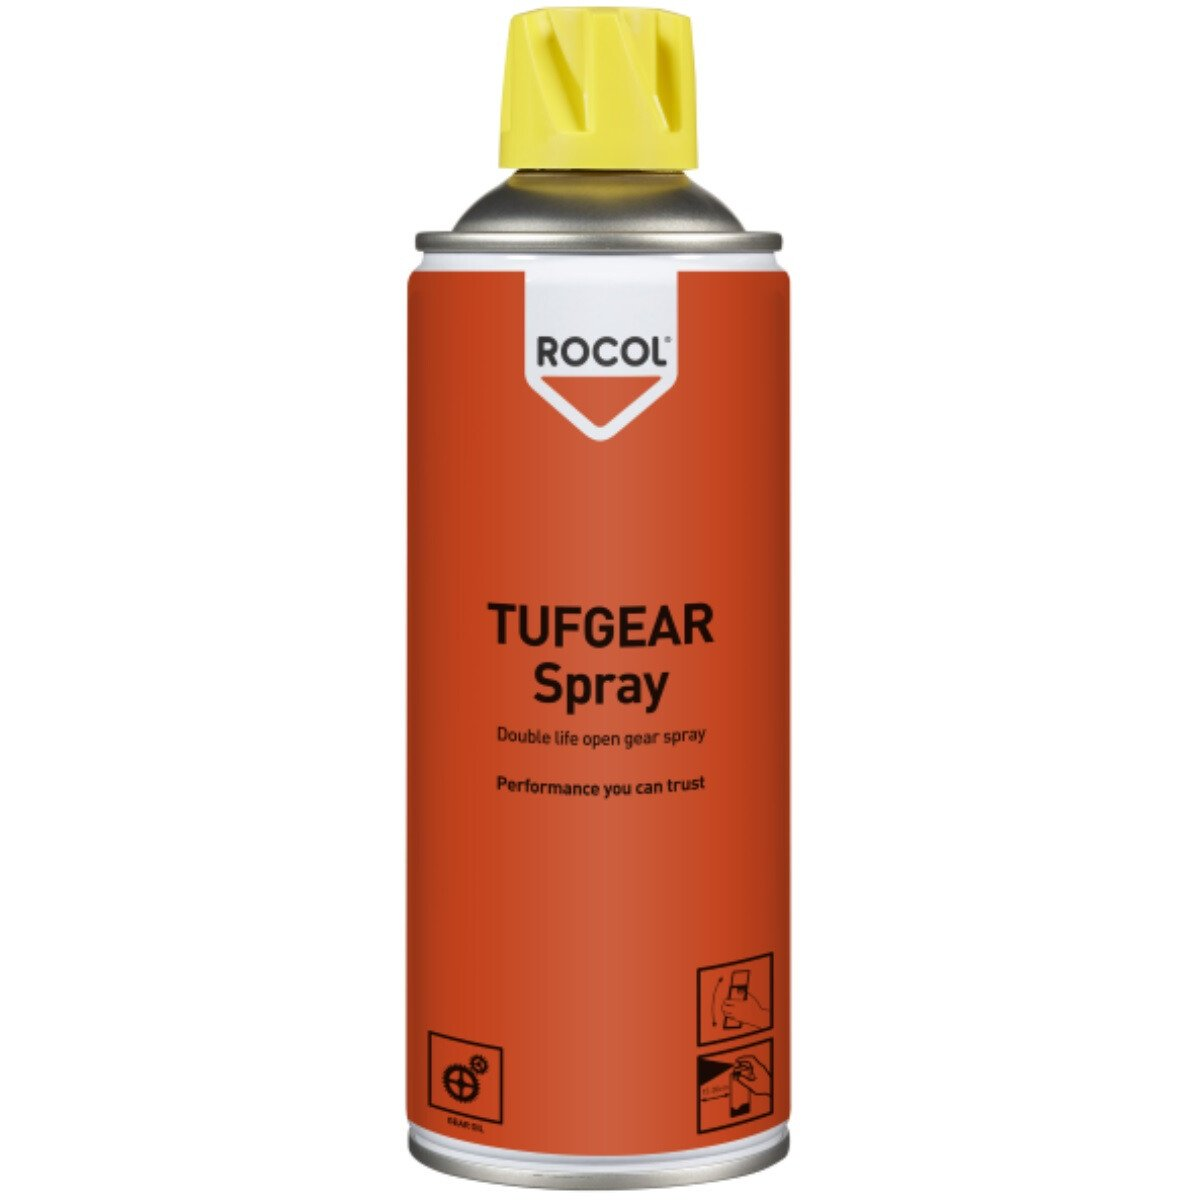 Rocol 18105 TUFGEAR SPRAY Open Gear Spray Lubricant 400ml